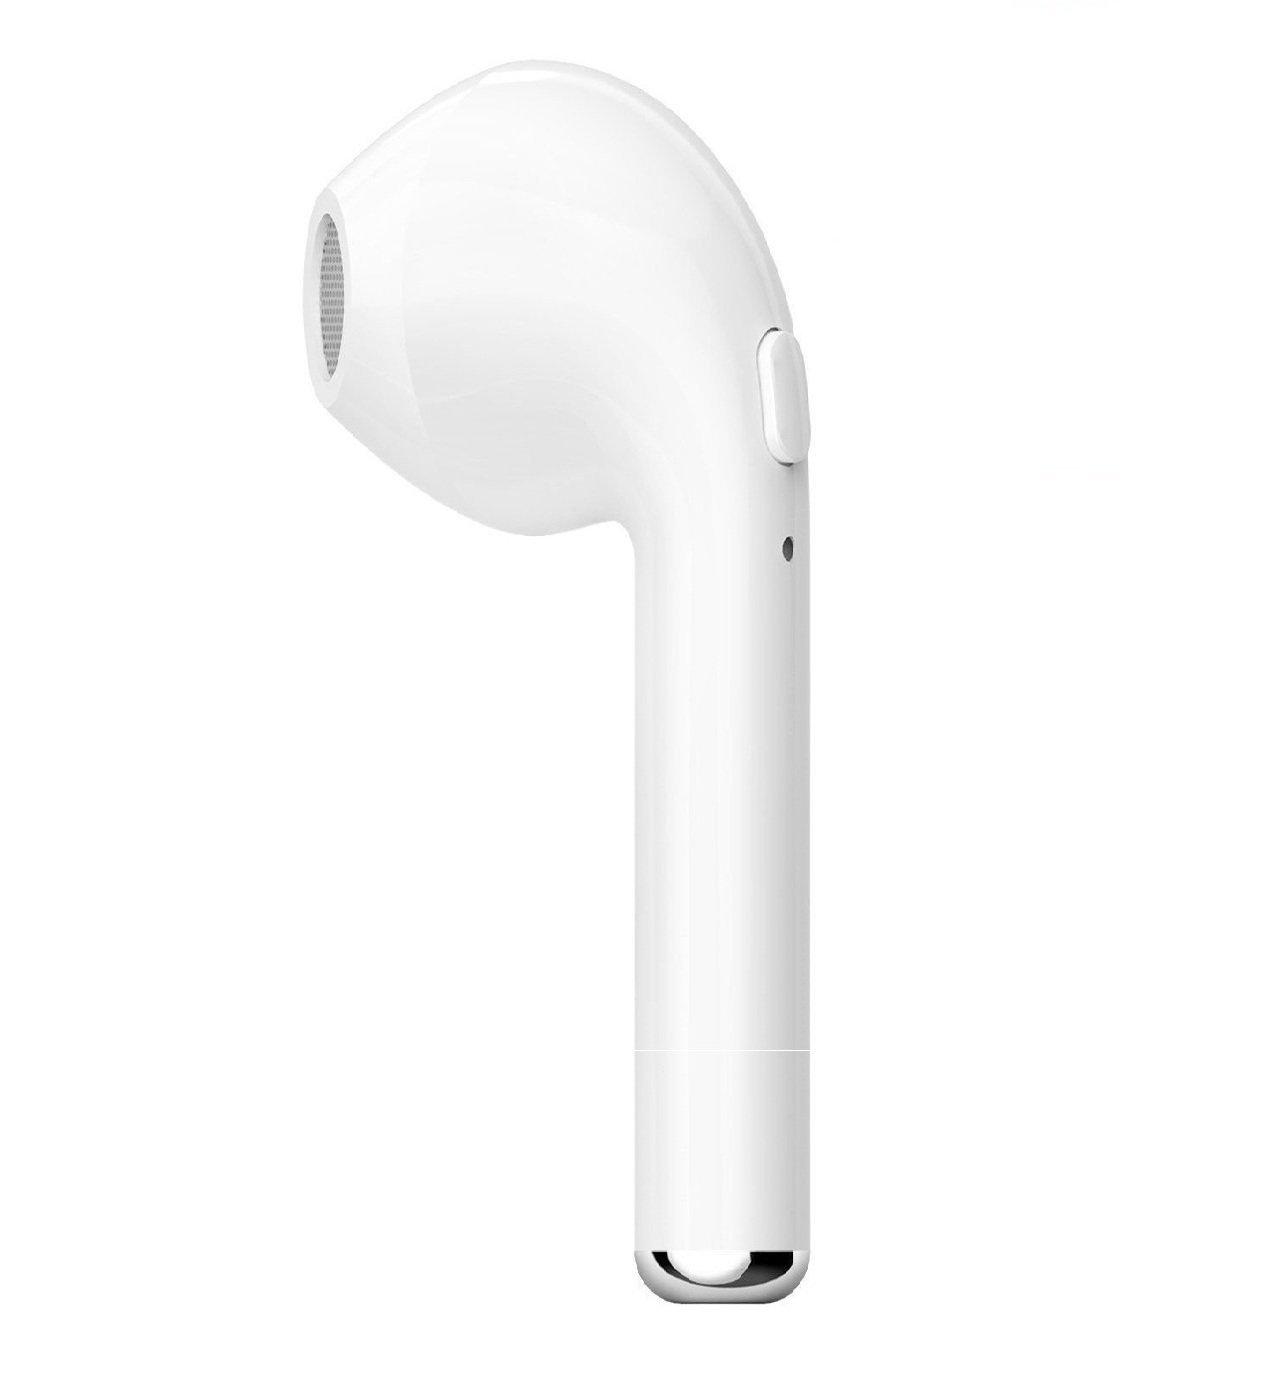 6b866db081d Rewy HBQ-i7 Single Stereo Mini Wireless Headset with: Amazon.in: Electronics